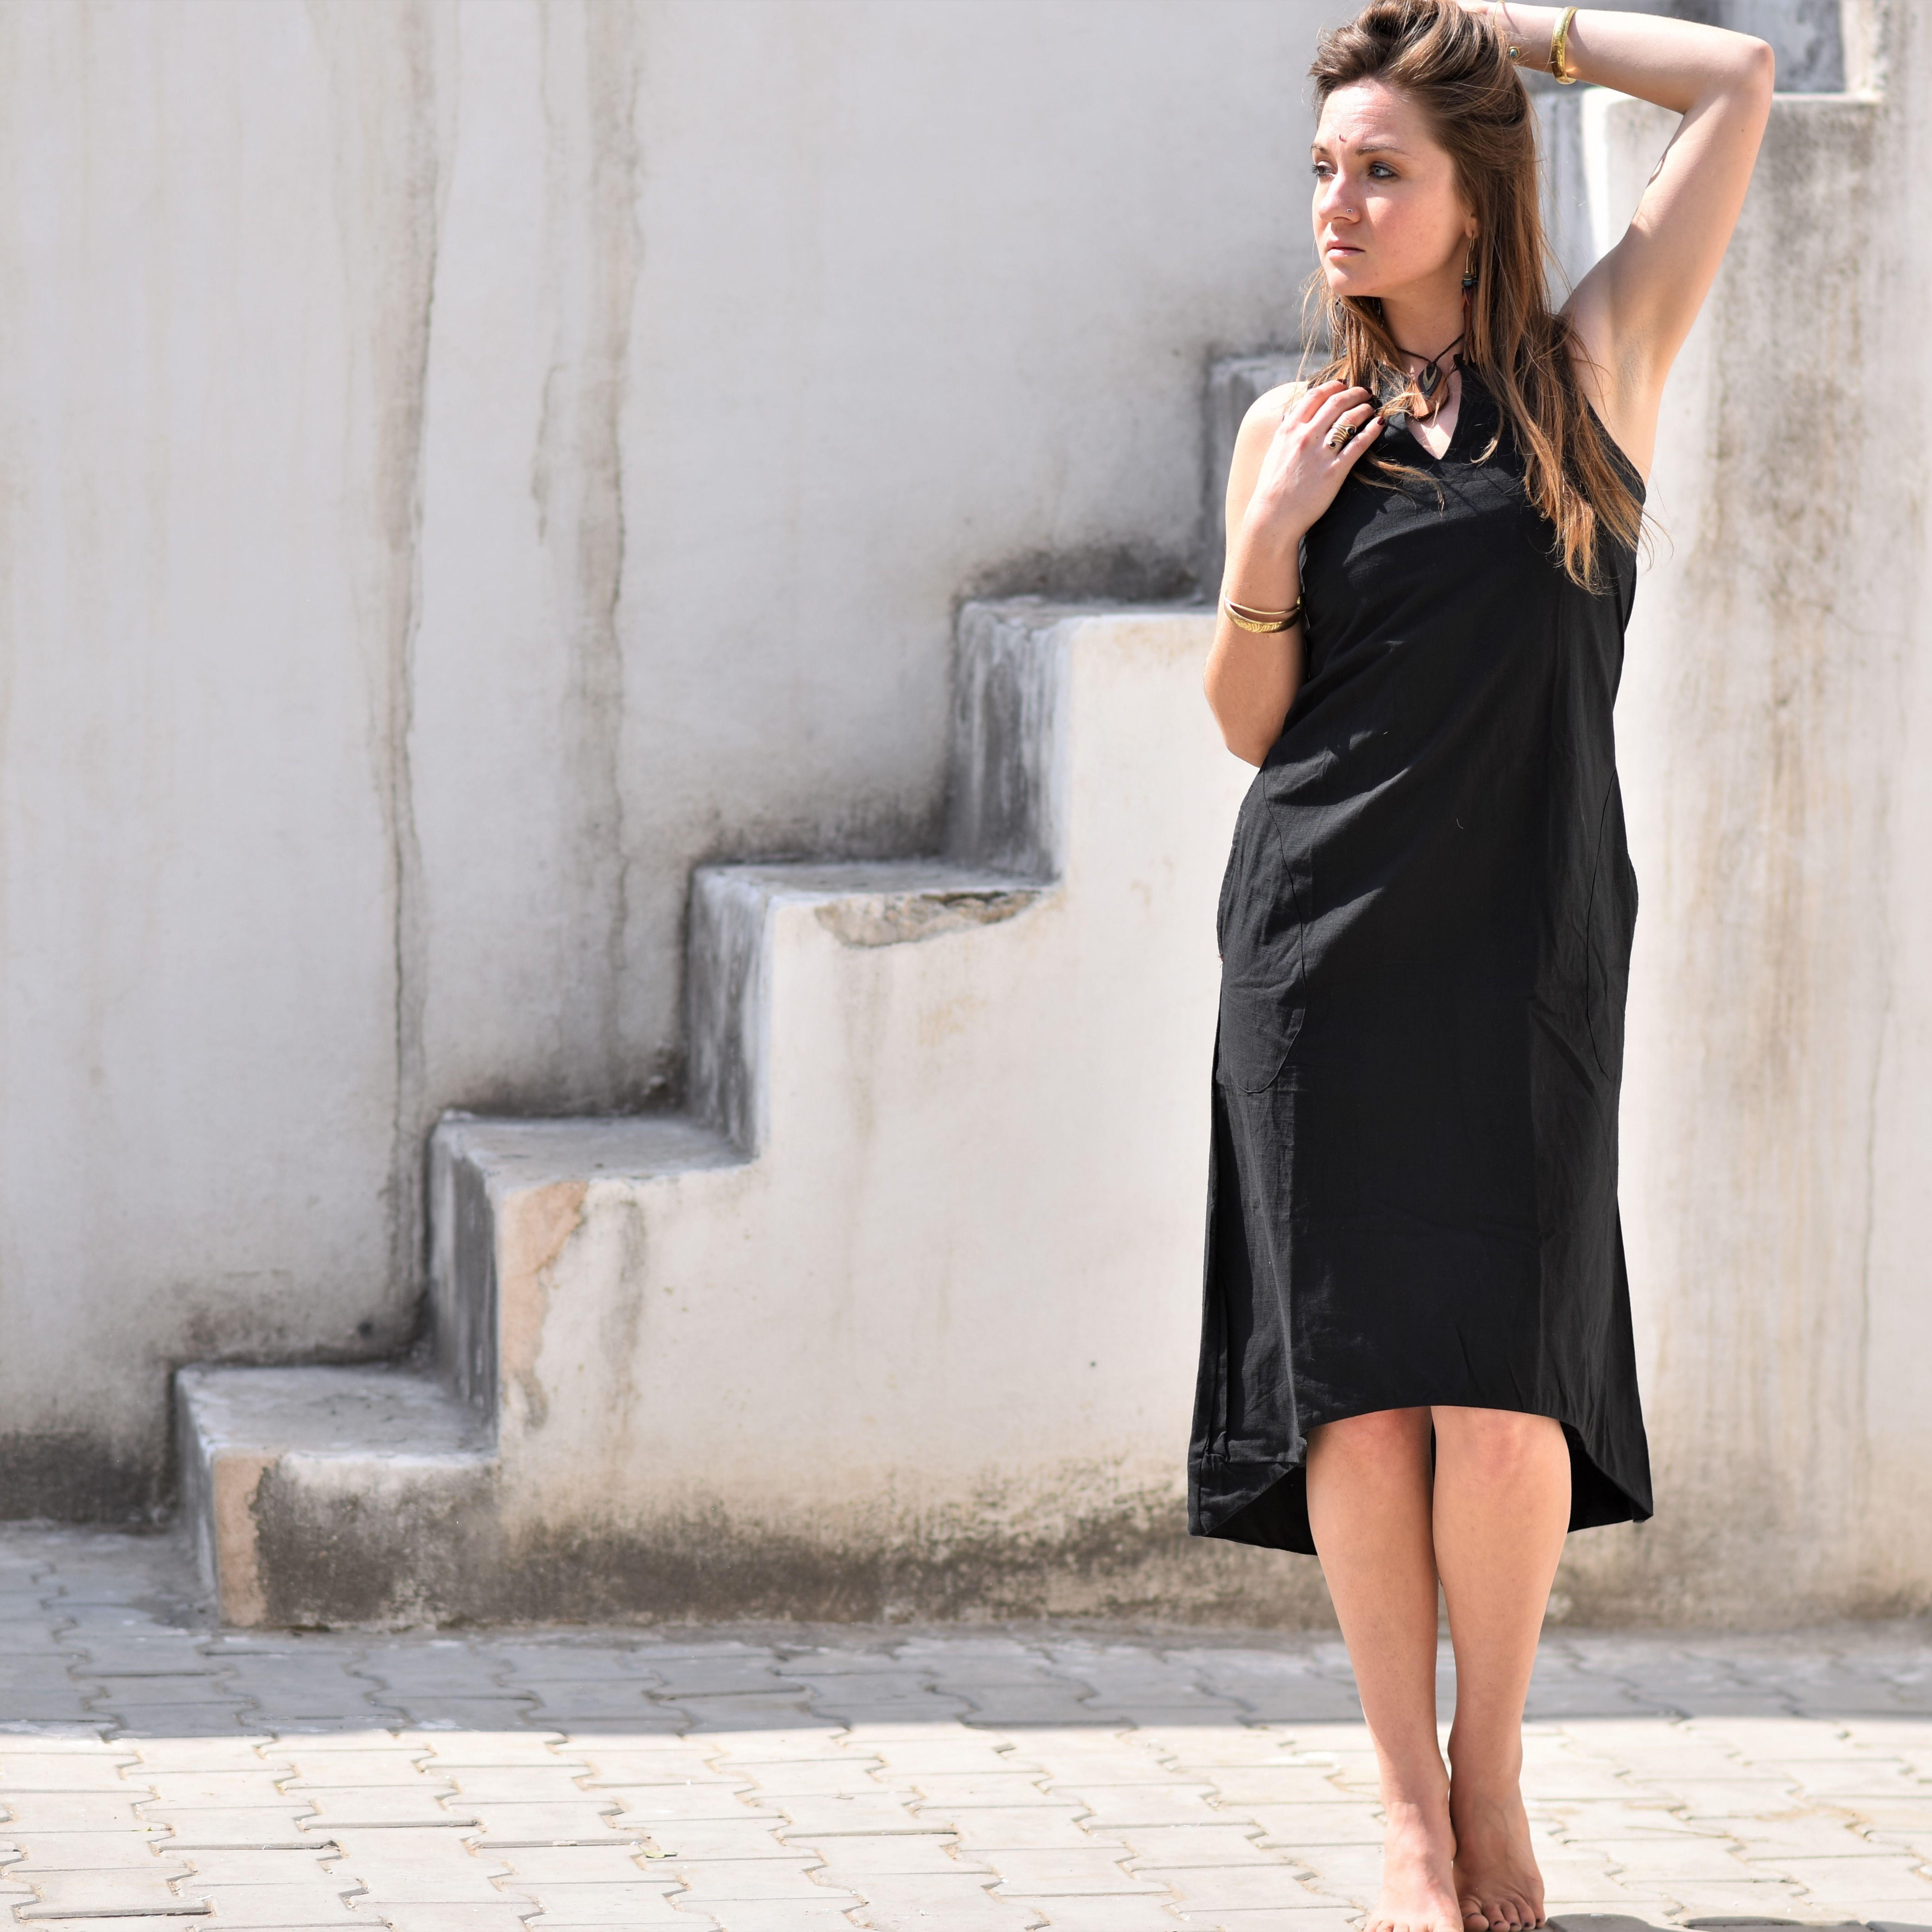 Black Summer Dress With Pockets Longer In The Back And A V Etsy Boho Style Outfits Summer Black Dress Black Boho Dress [ 6907 x 6907 Pixel ]